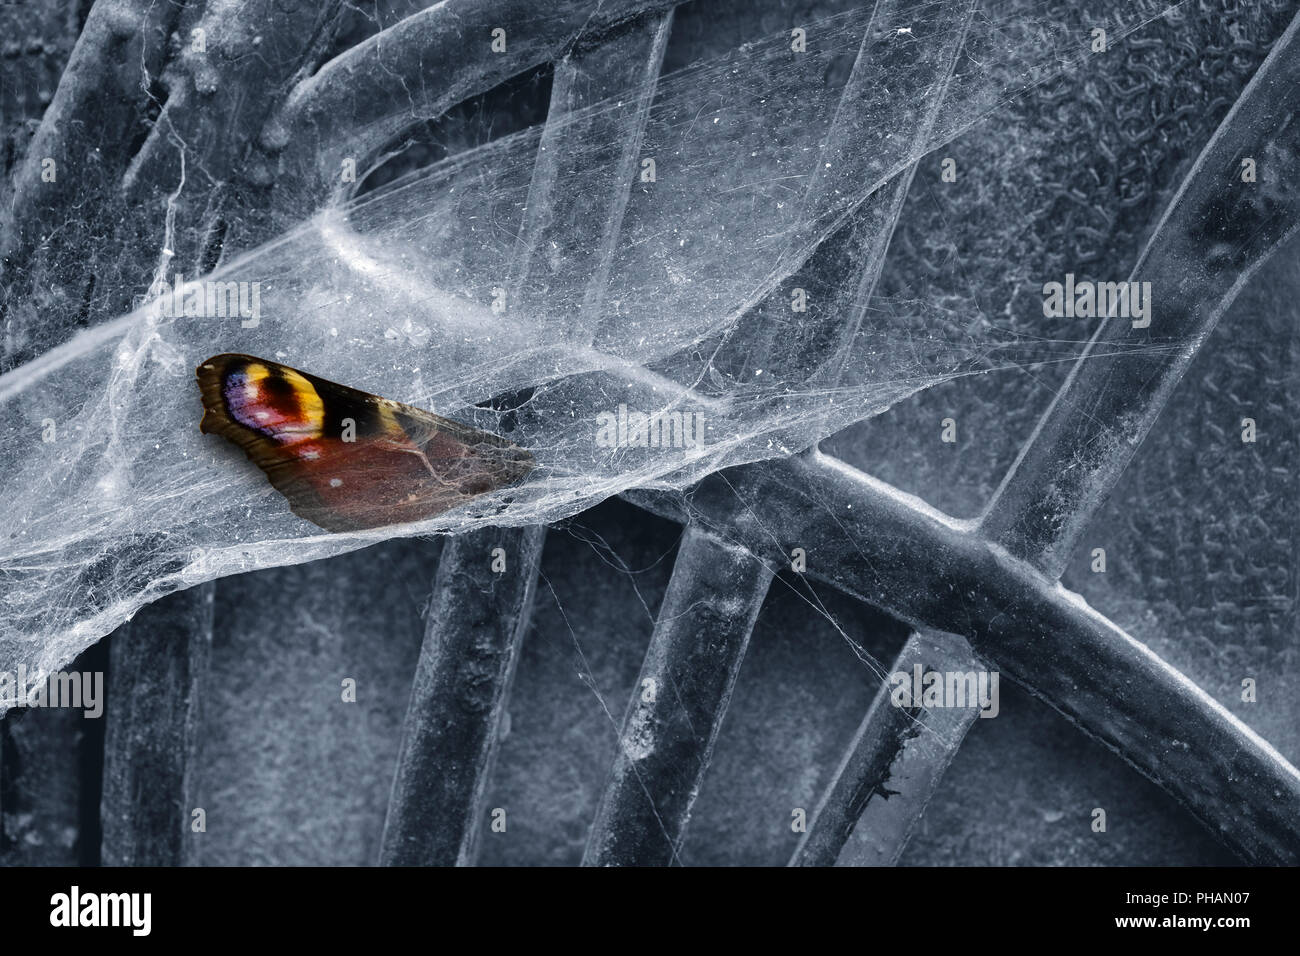 Spider webs - Stock Image